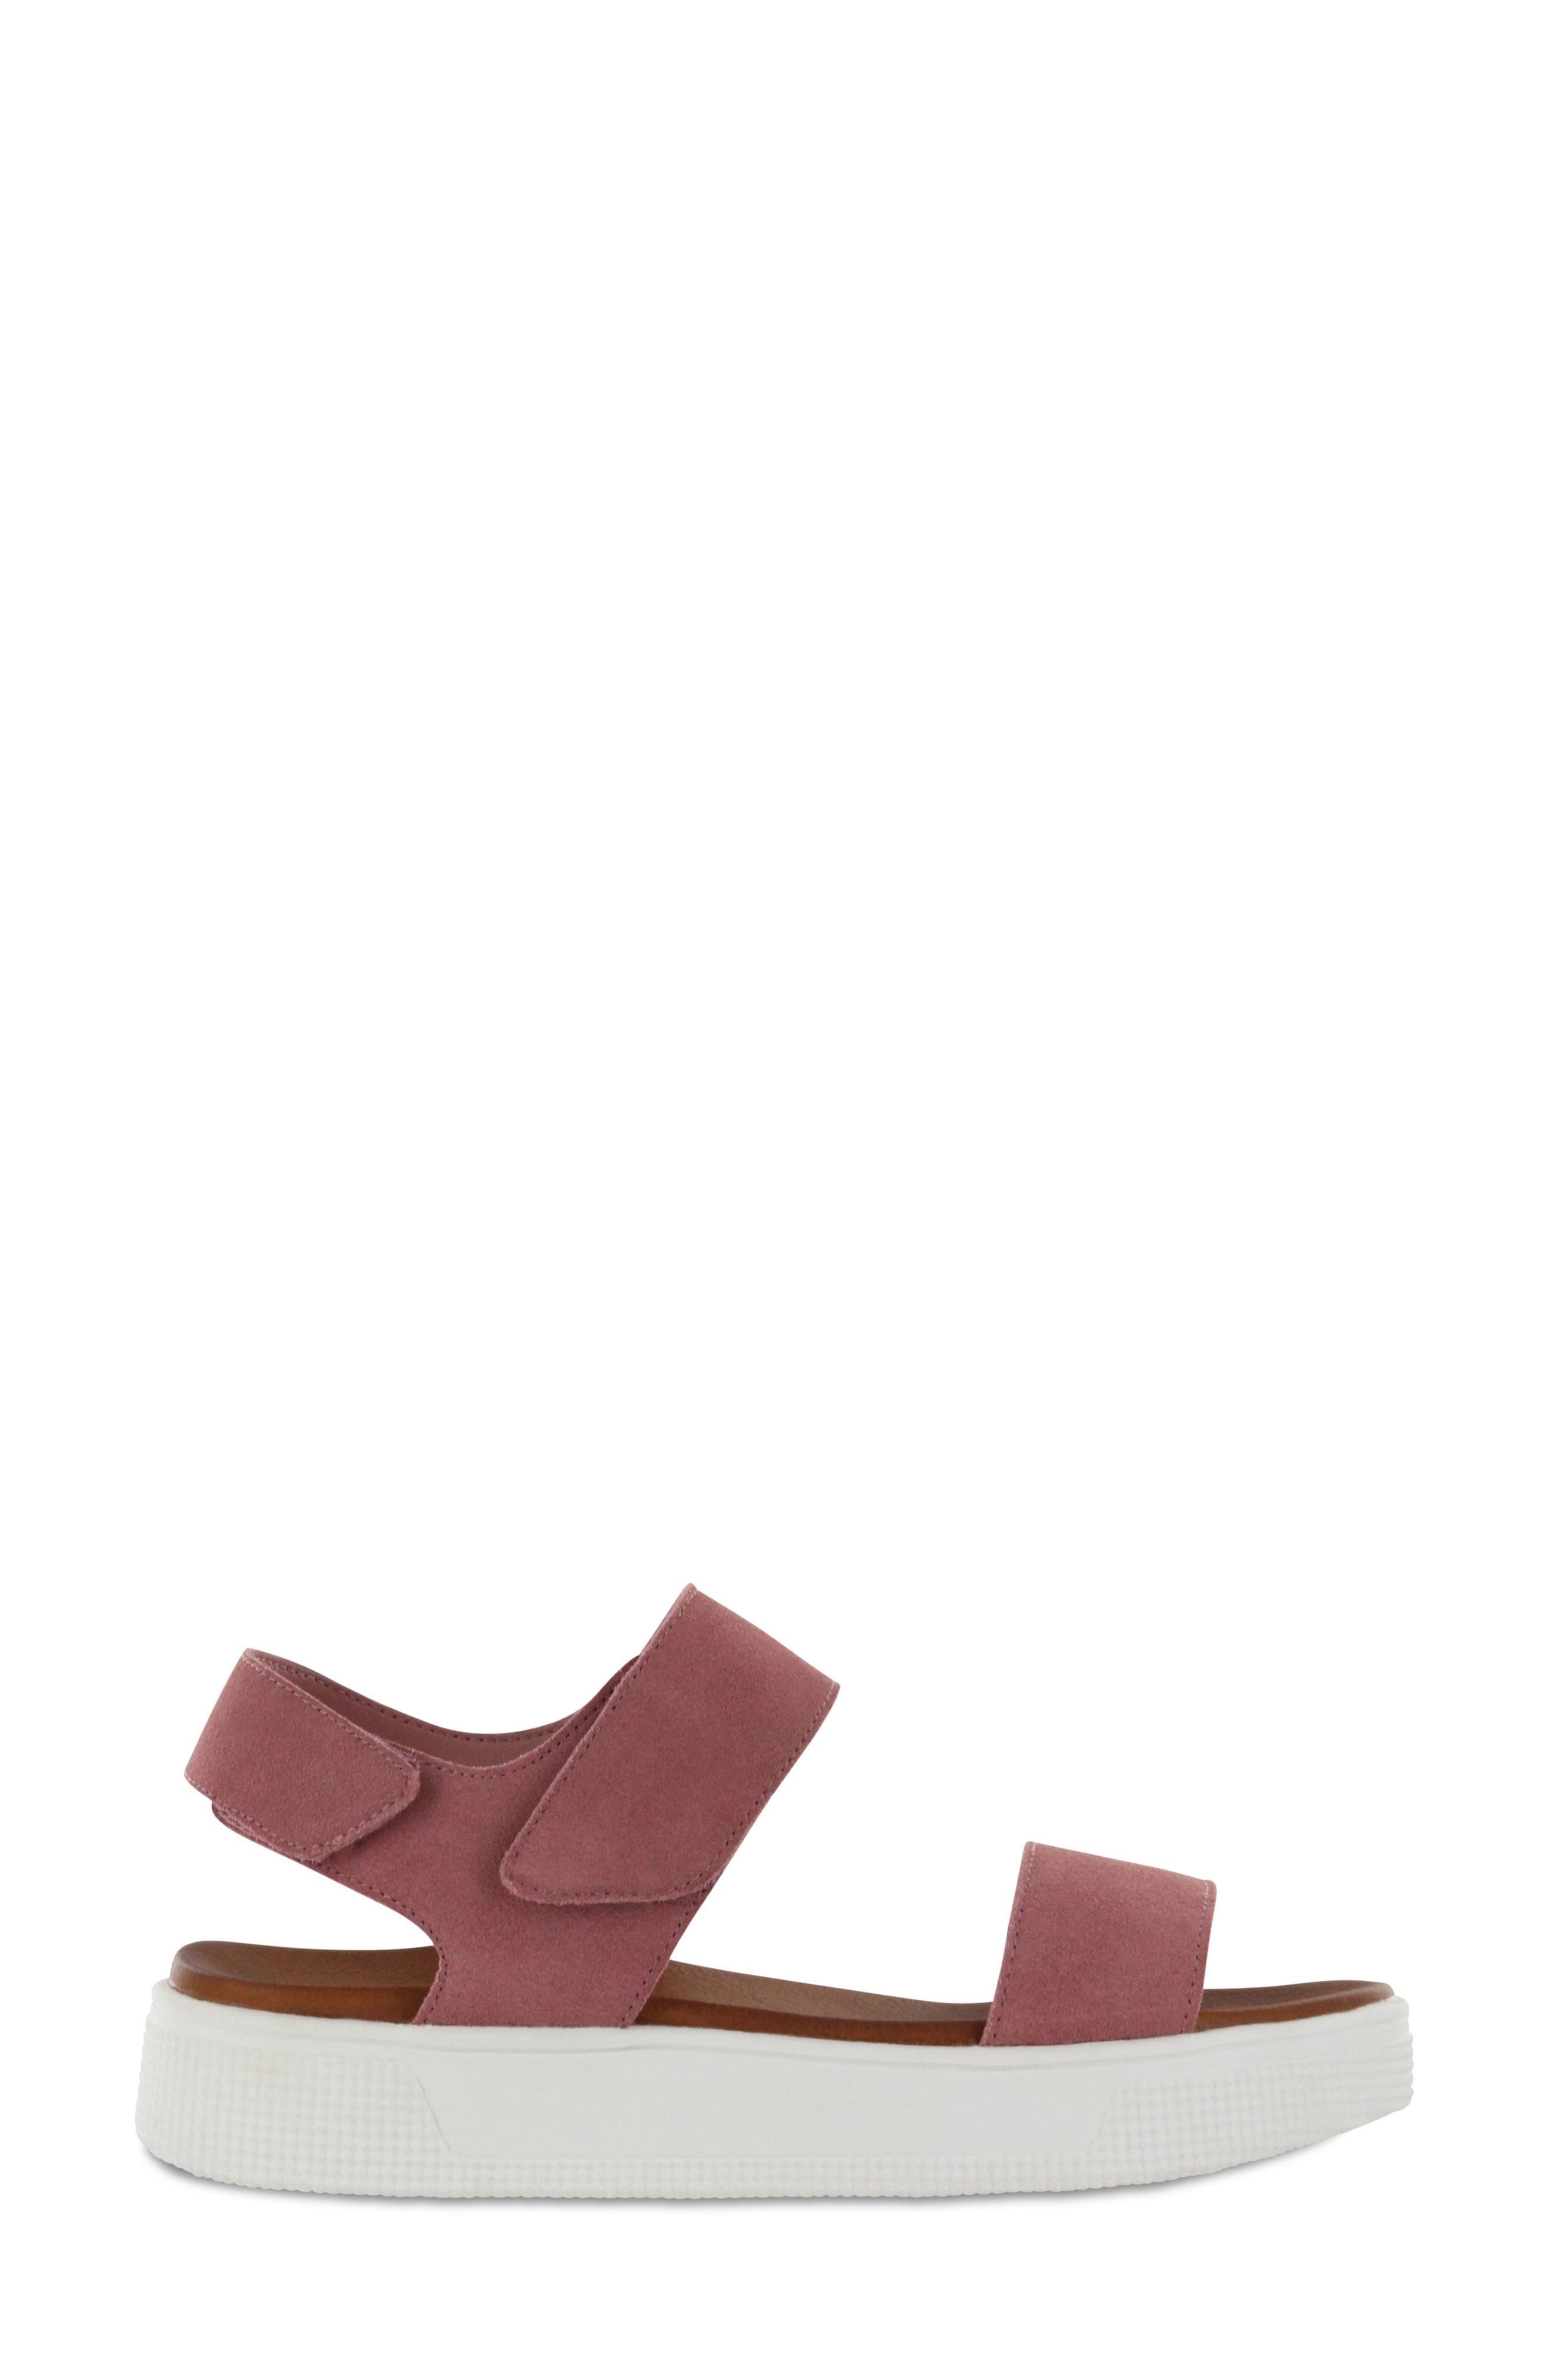 Troy Slingback Platform Sandal,                             Alternate thumbnail 3, color,                             Mauve Suede